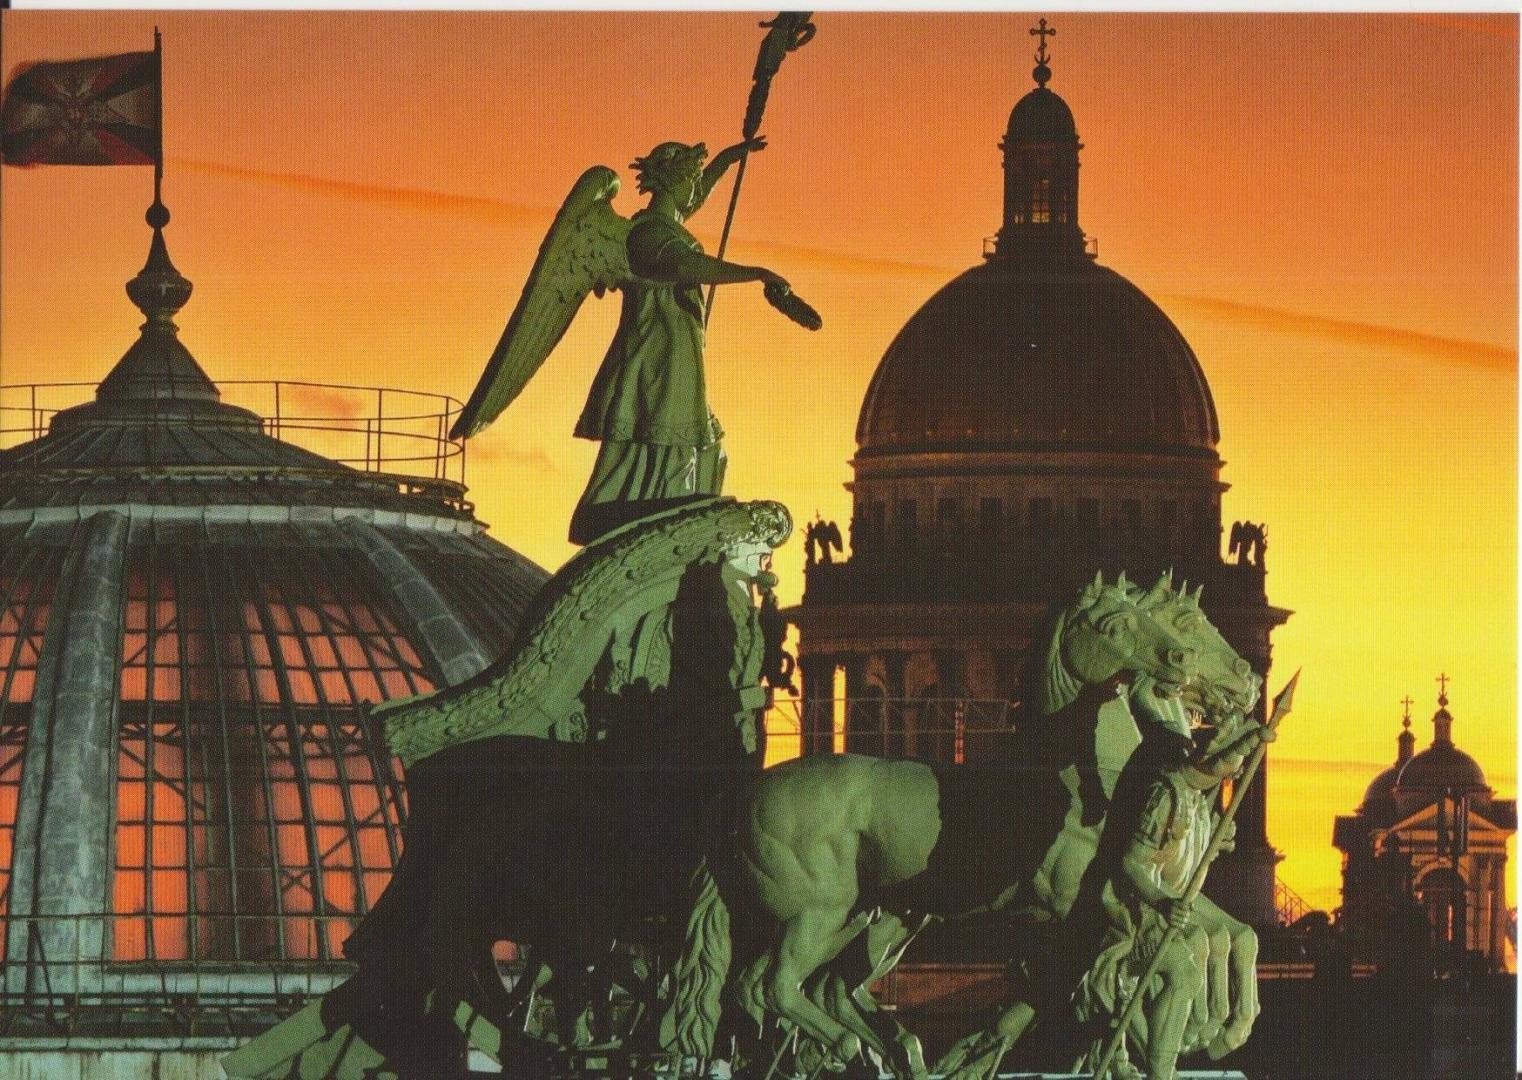 все петросян открытки петербург подходит